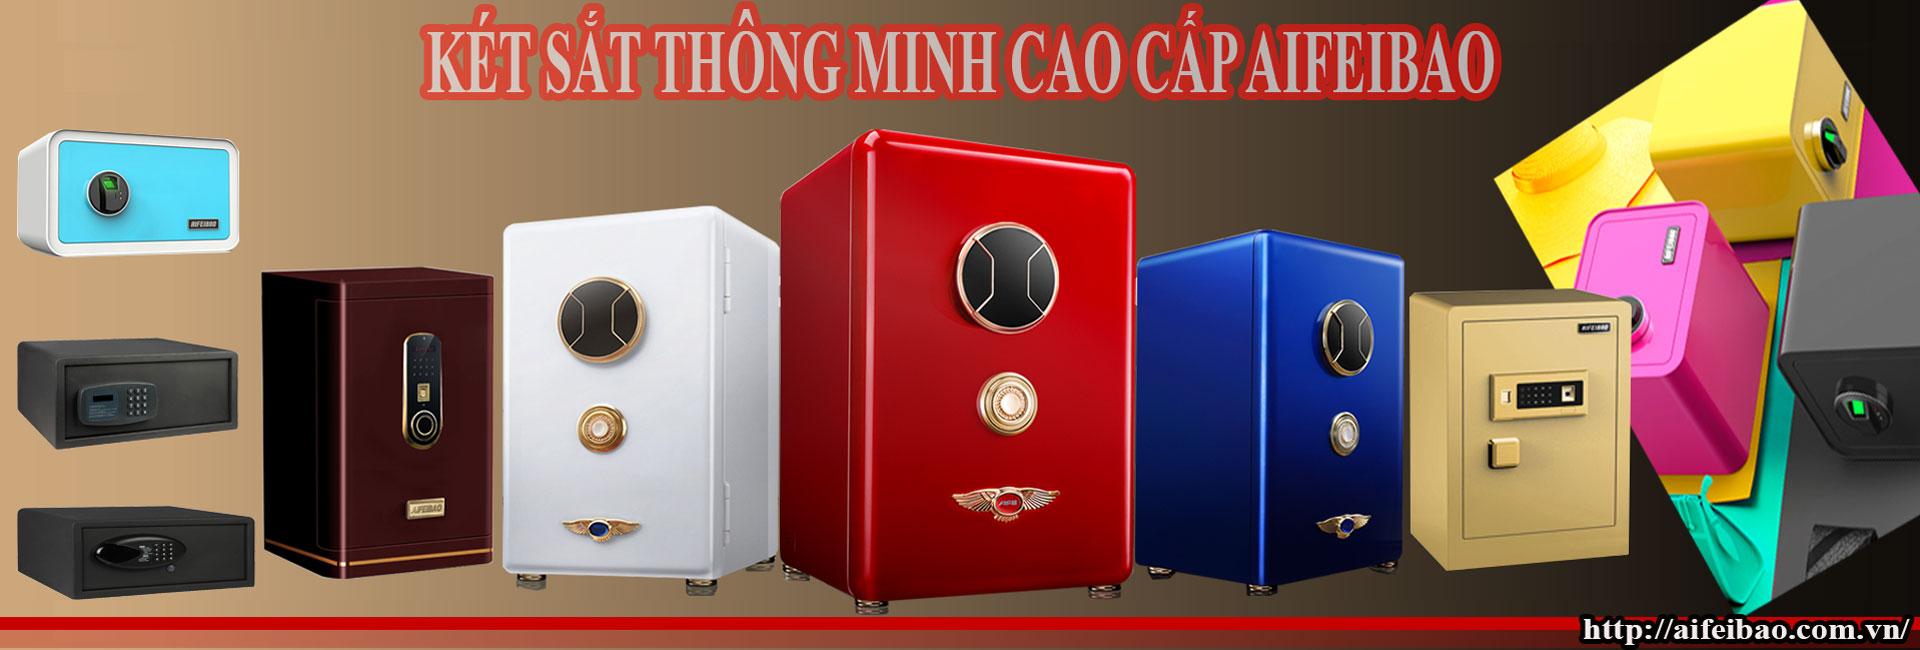 ket sat aifeibao.com.vn